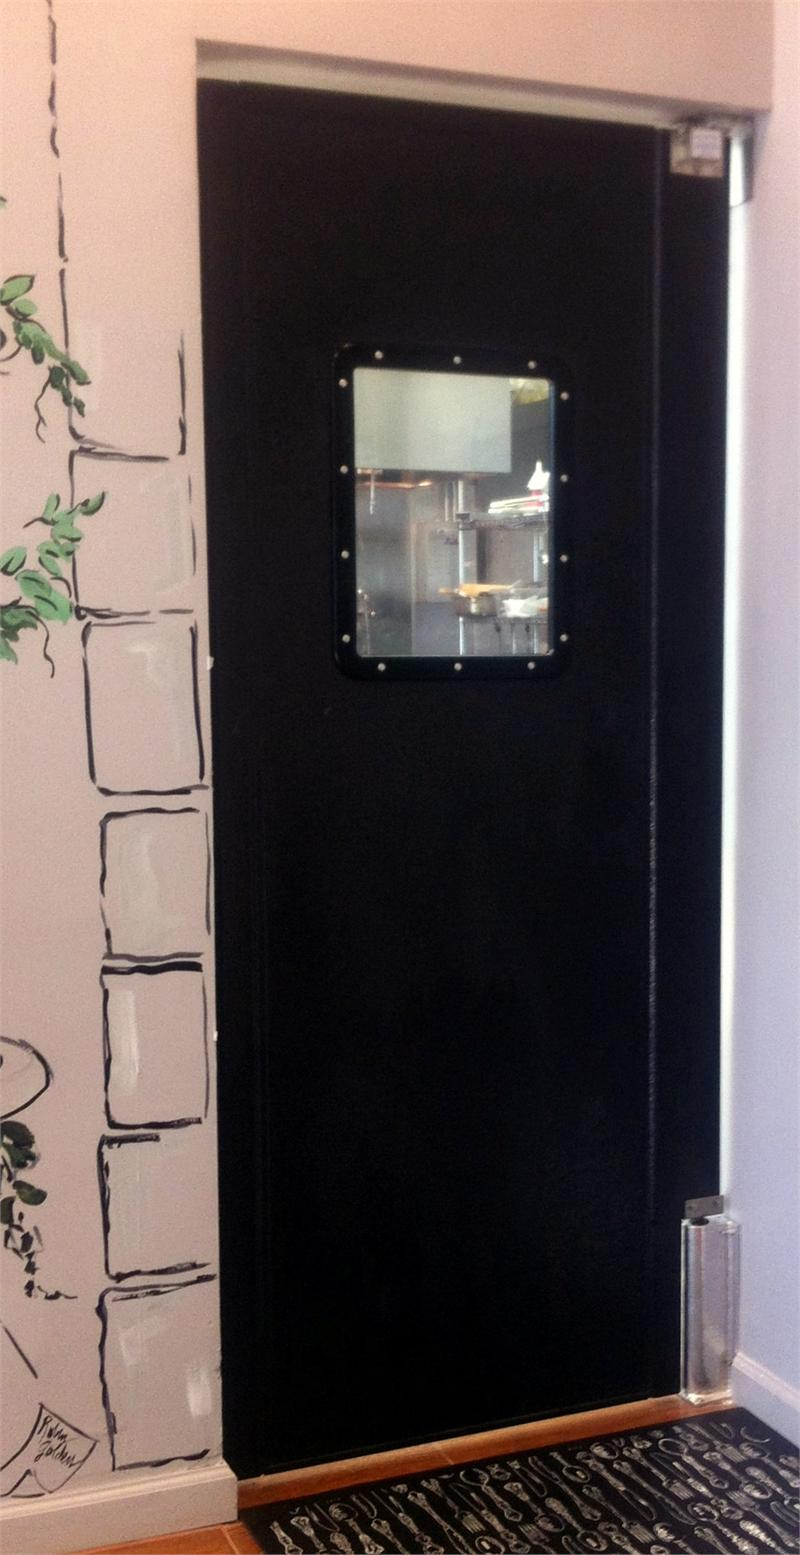 Selling restaurant doors stainless steel double door for for Kitchen doors and more